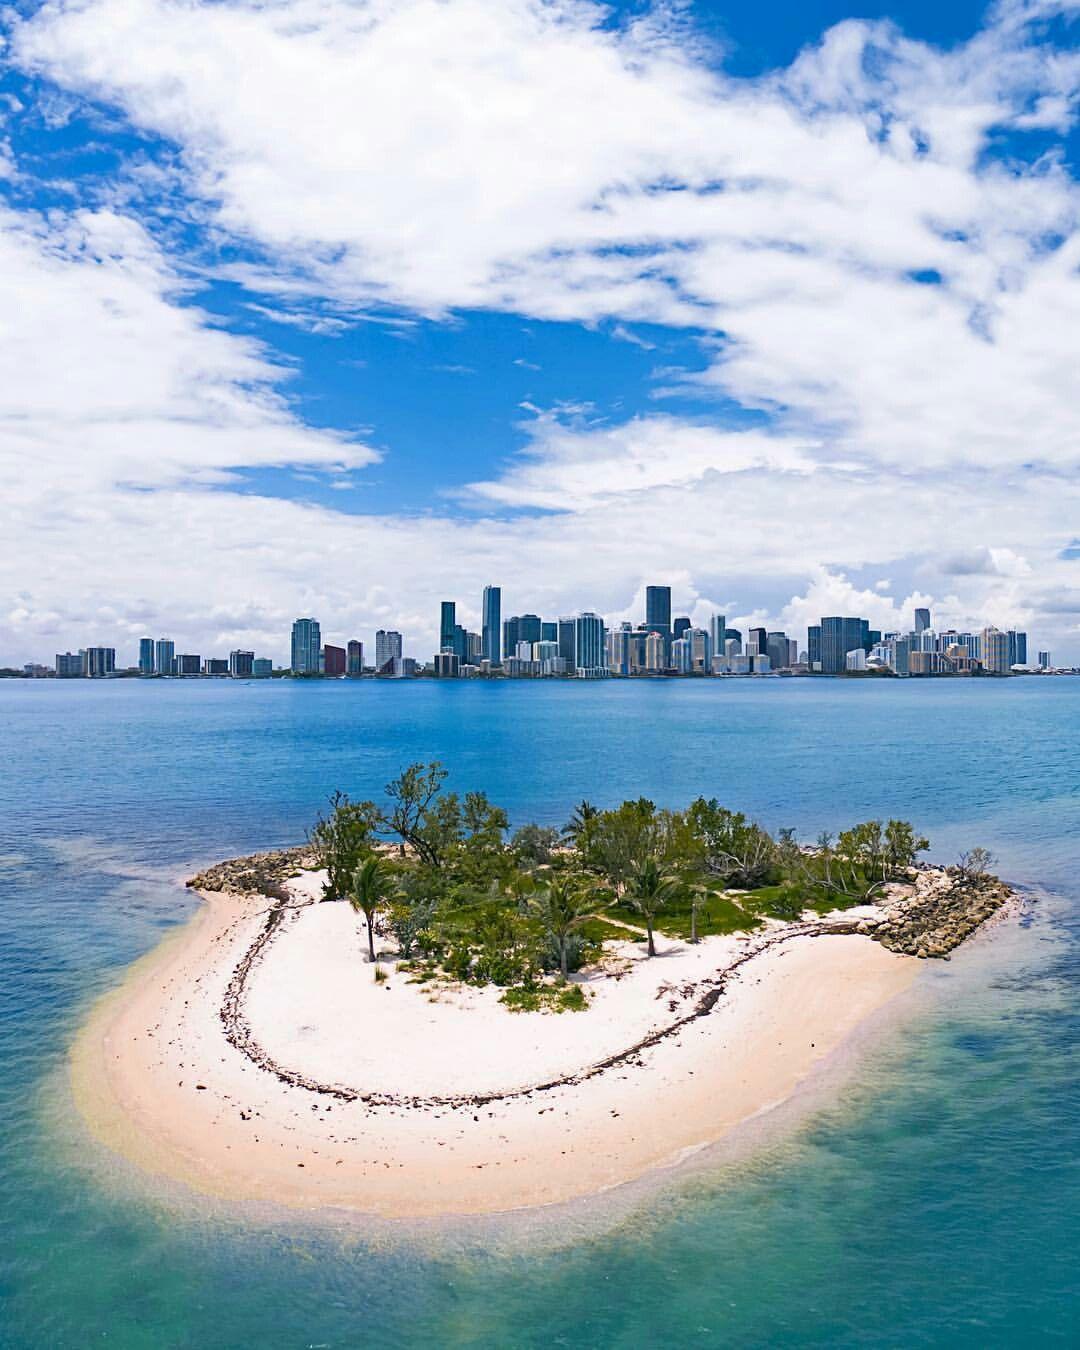 Deserted Island Beach: Beaches In The World, Miami